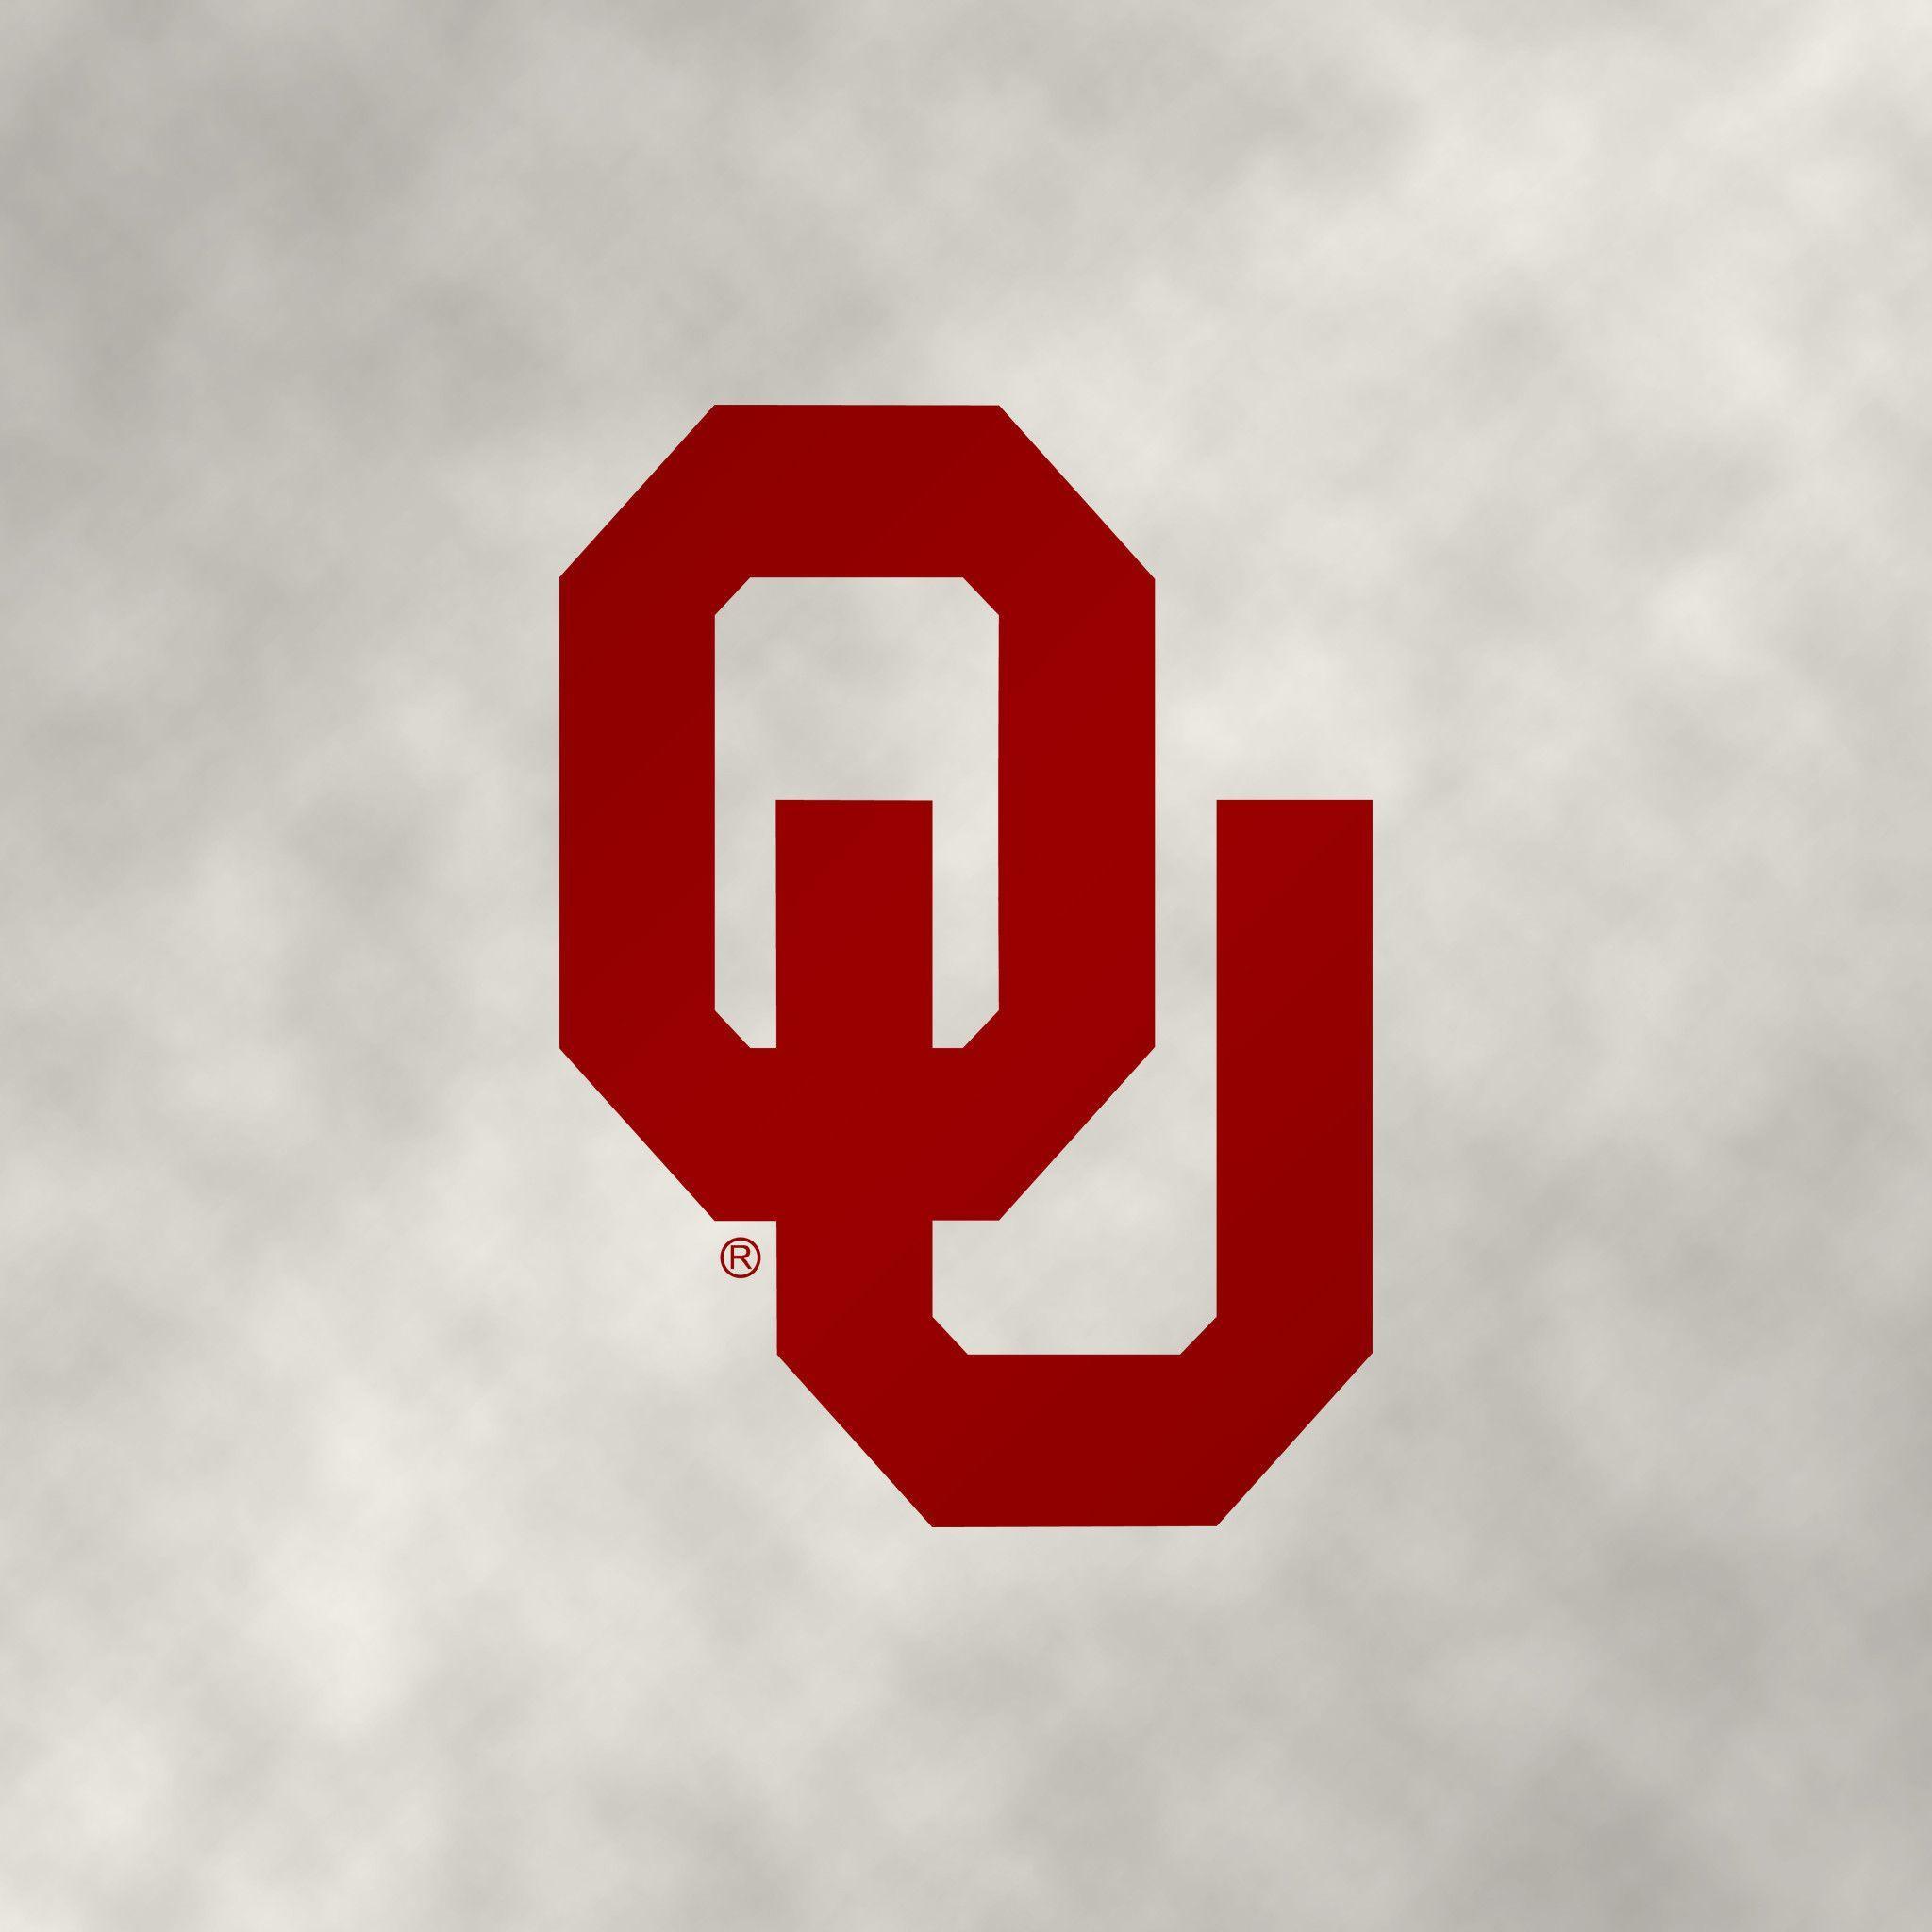 Oklahoma Sooners Wallpapers 2048x2048